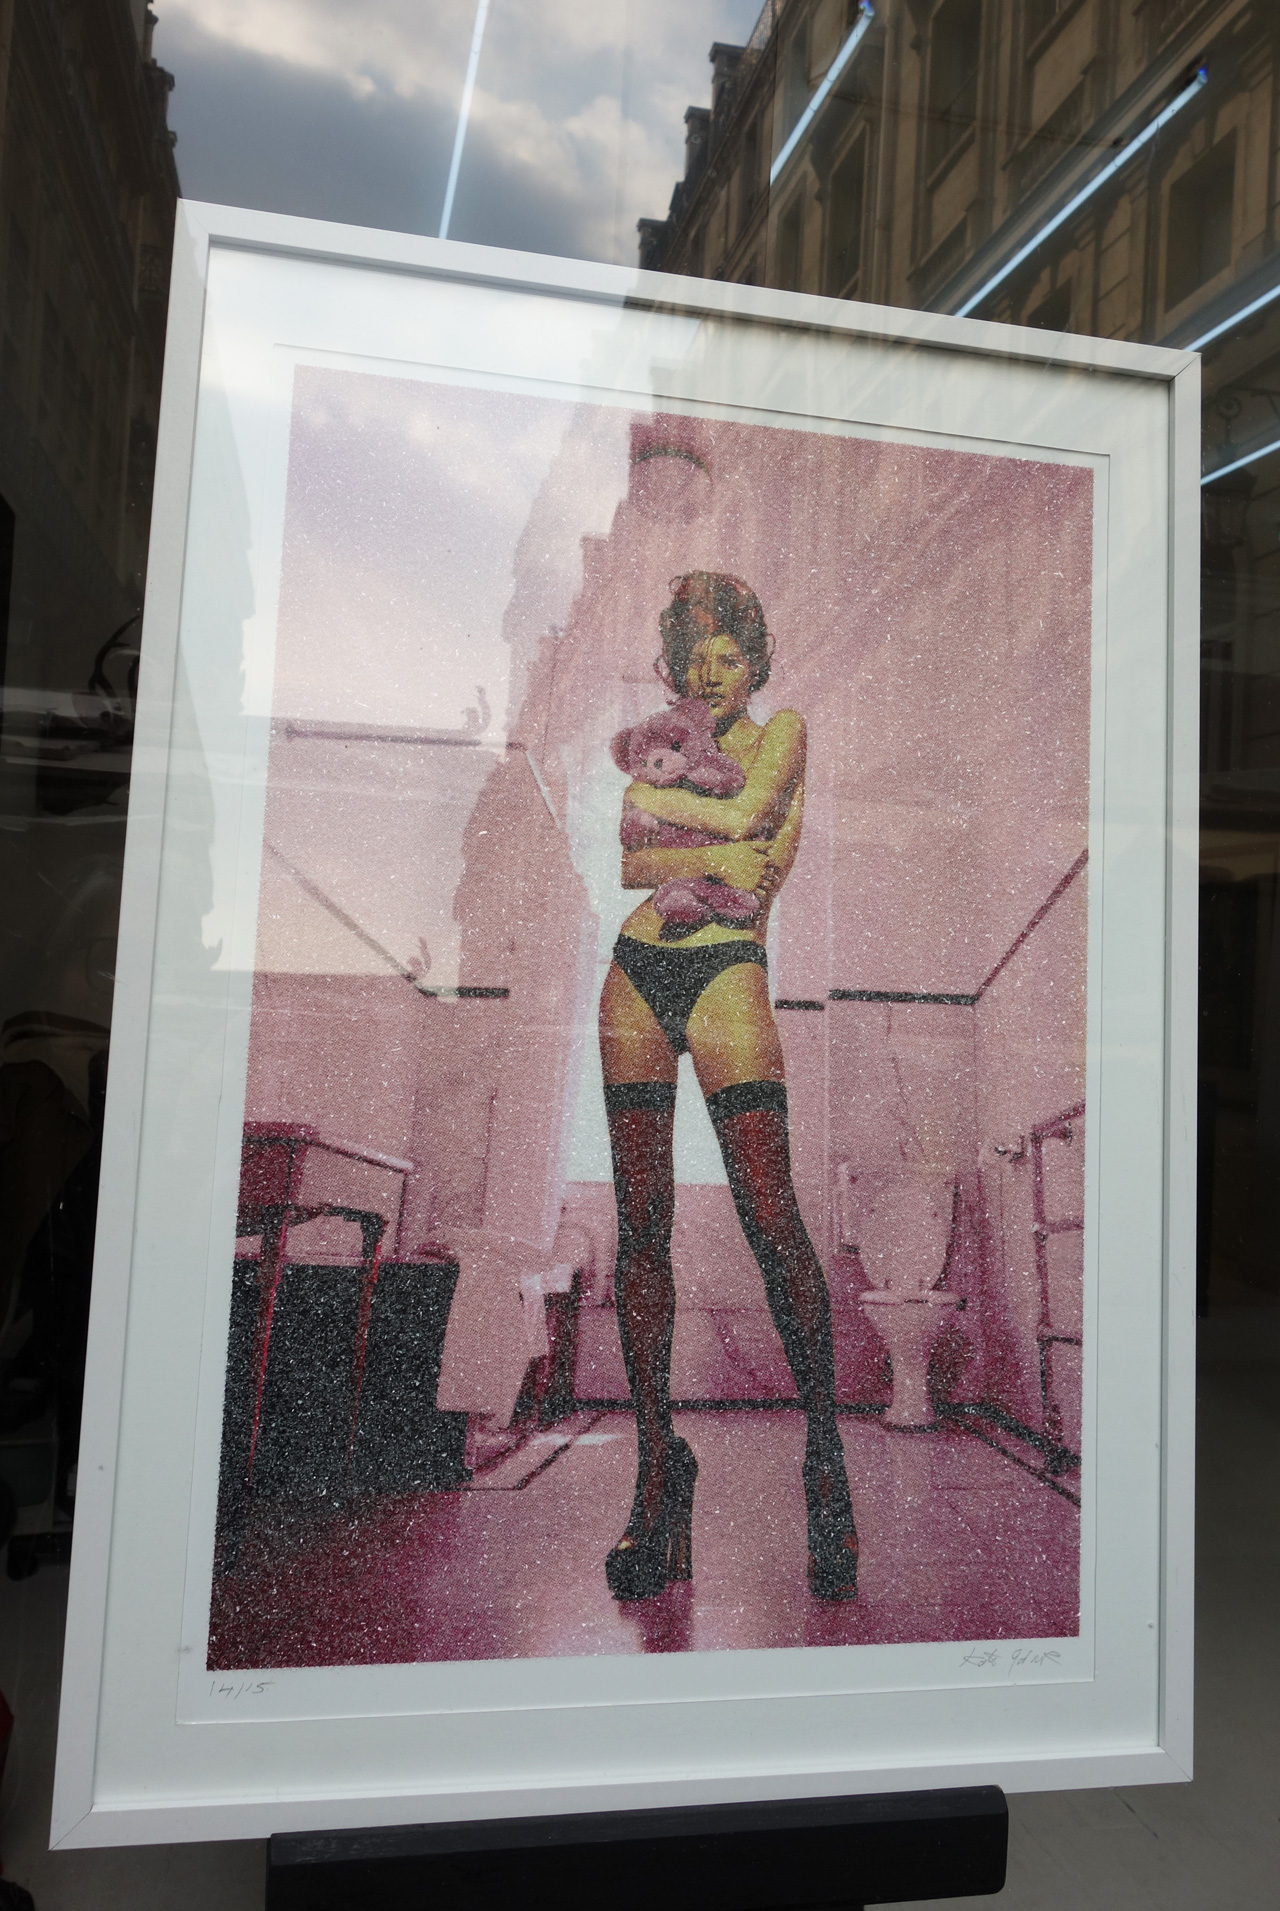 Galerie-13-Jeannette-Mariani-pink-girl-teddy-bear